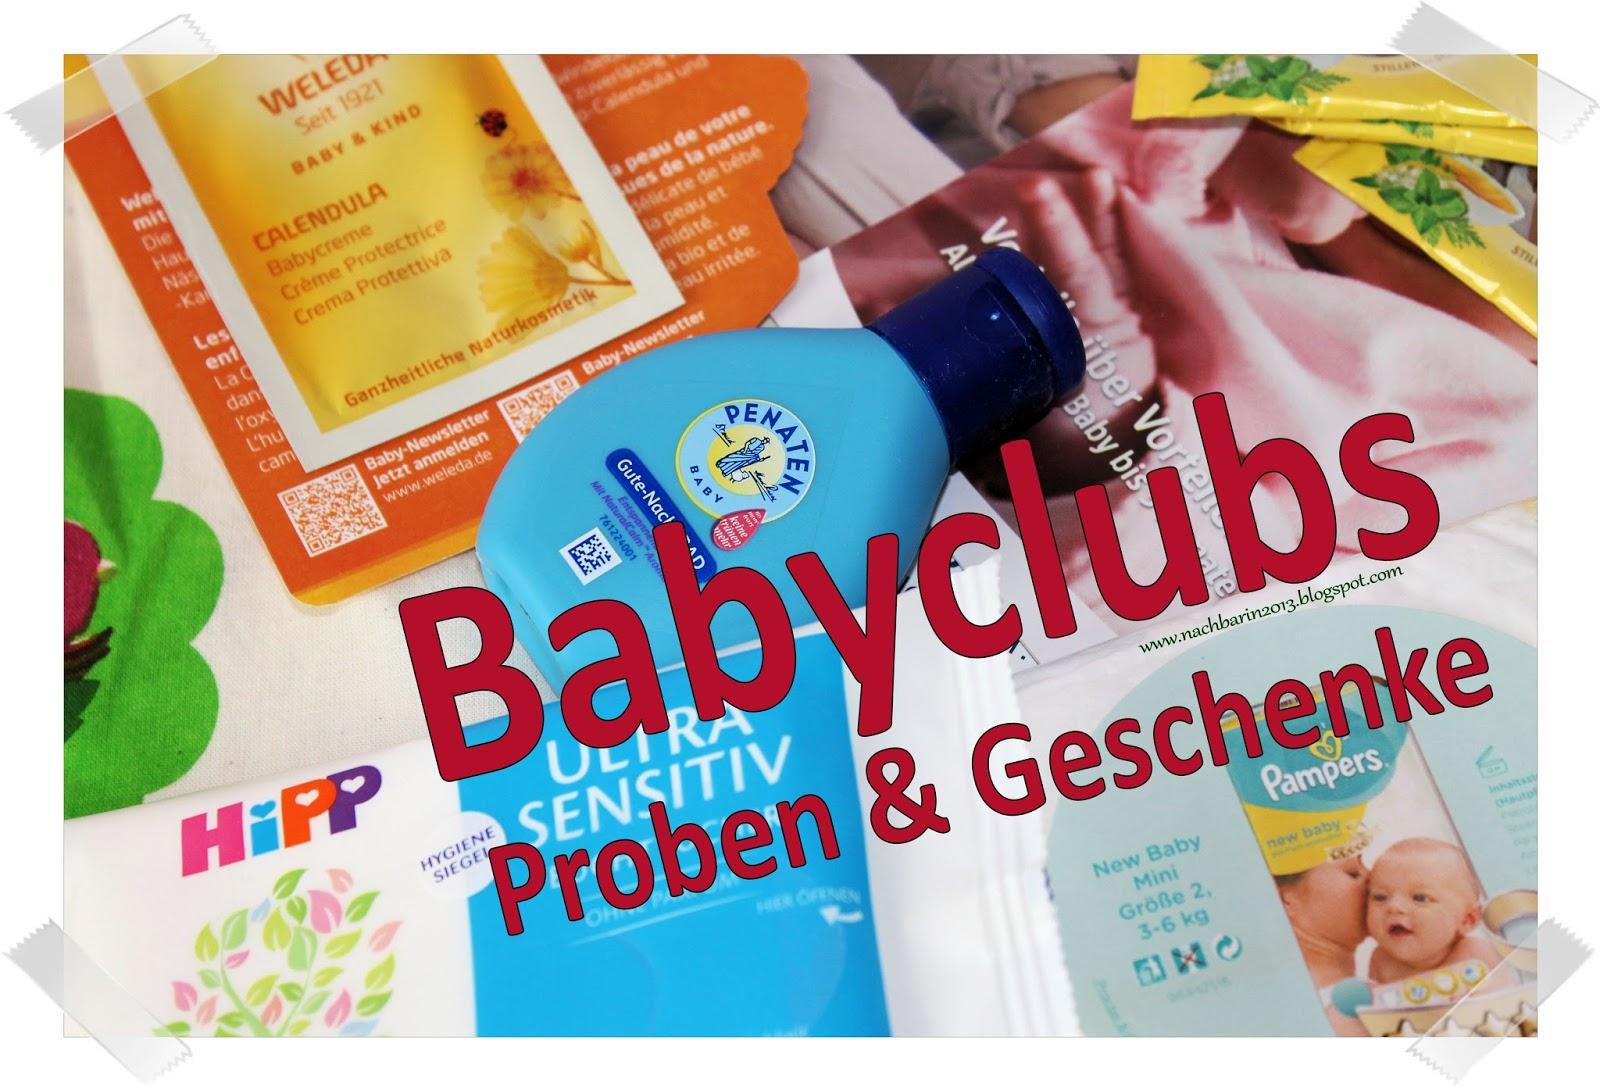 willkommensgeschenke baby gratis